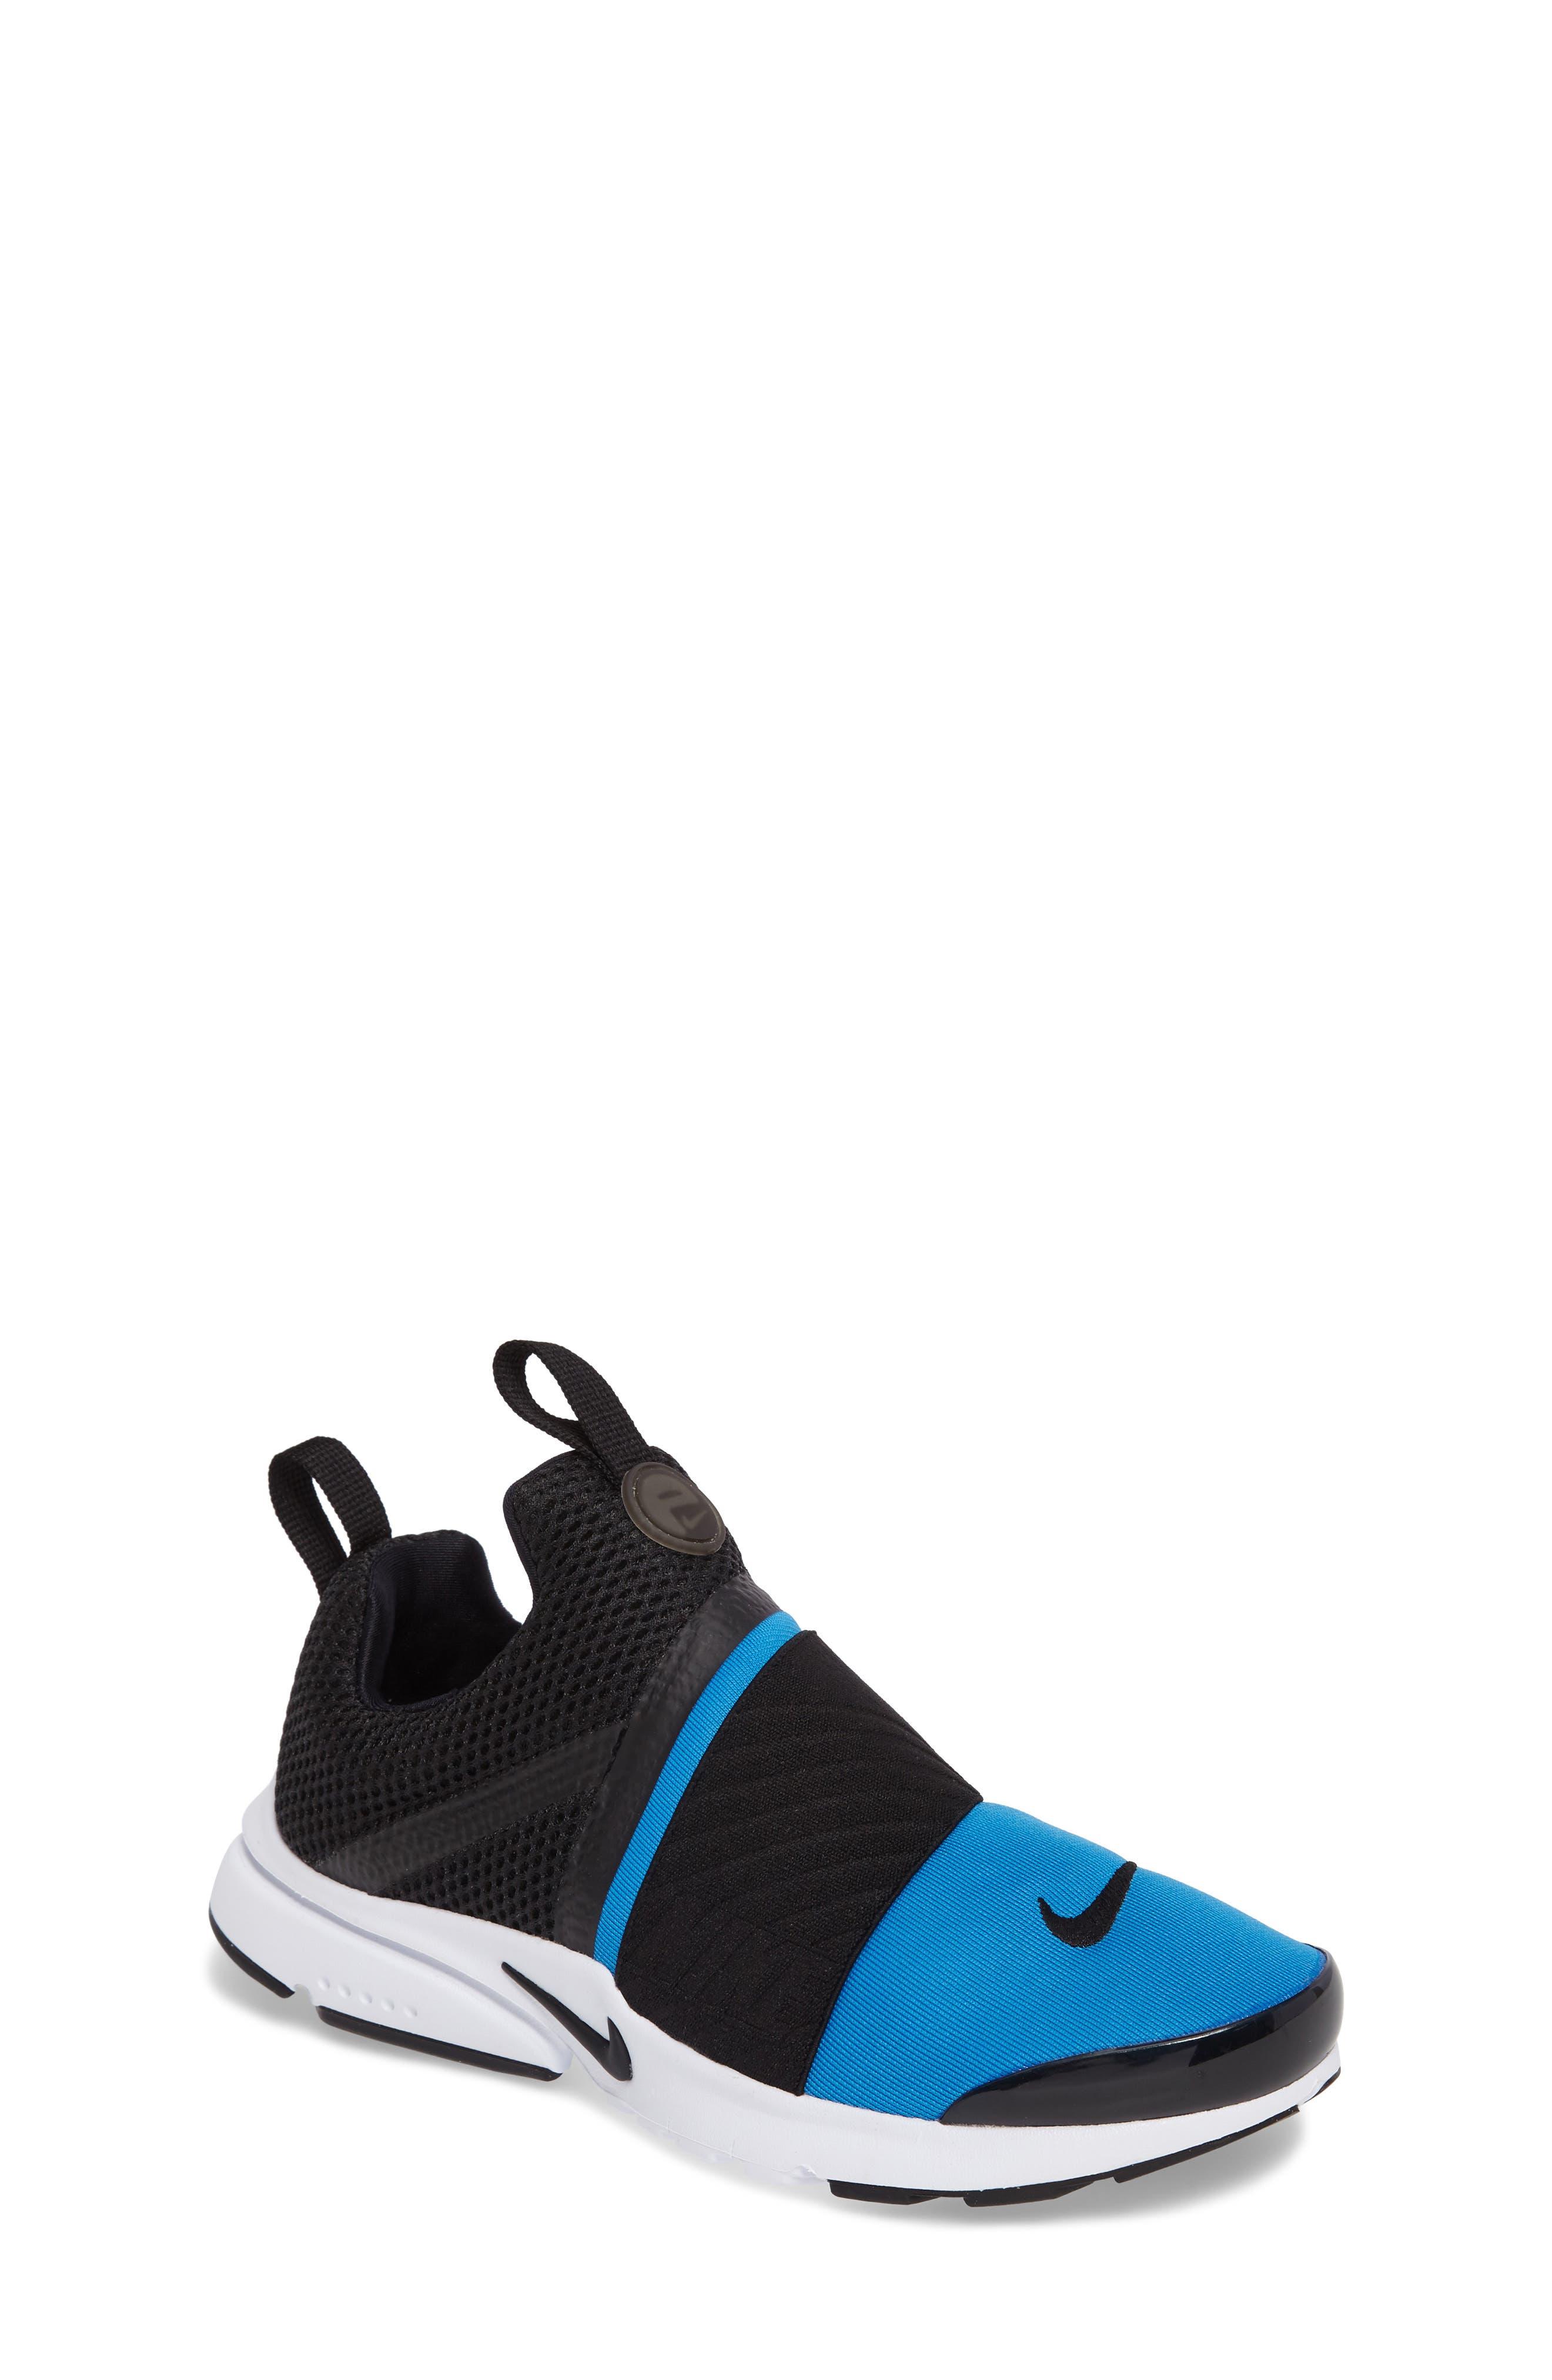 Presto Extreme Sneaker,                             Main thumbnail 10, color,